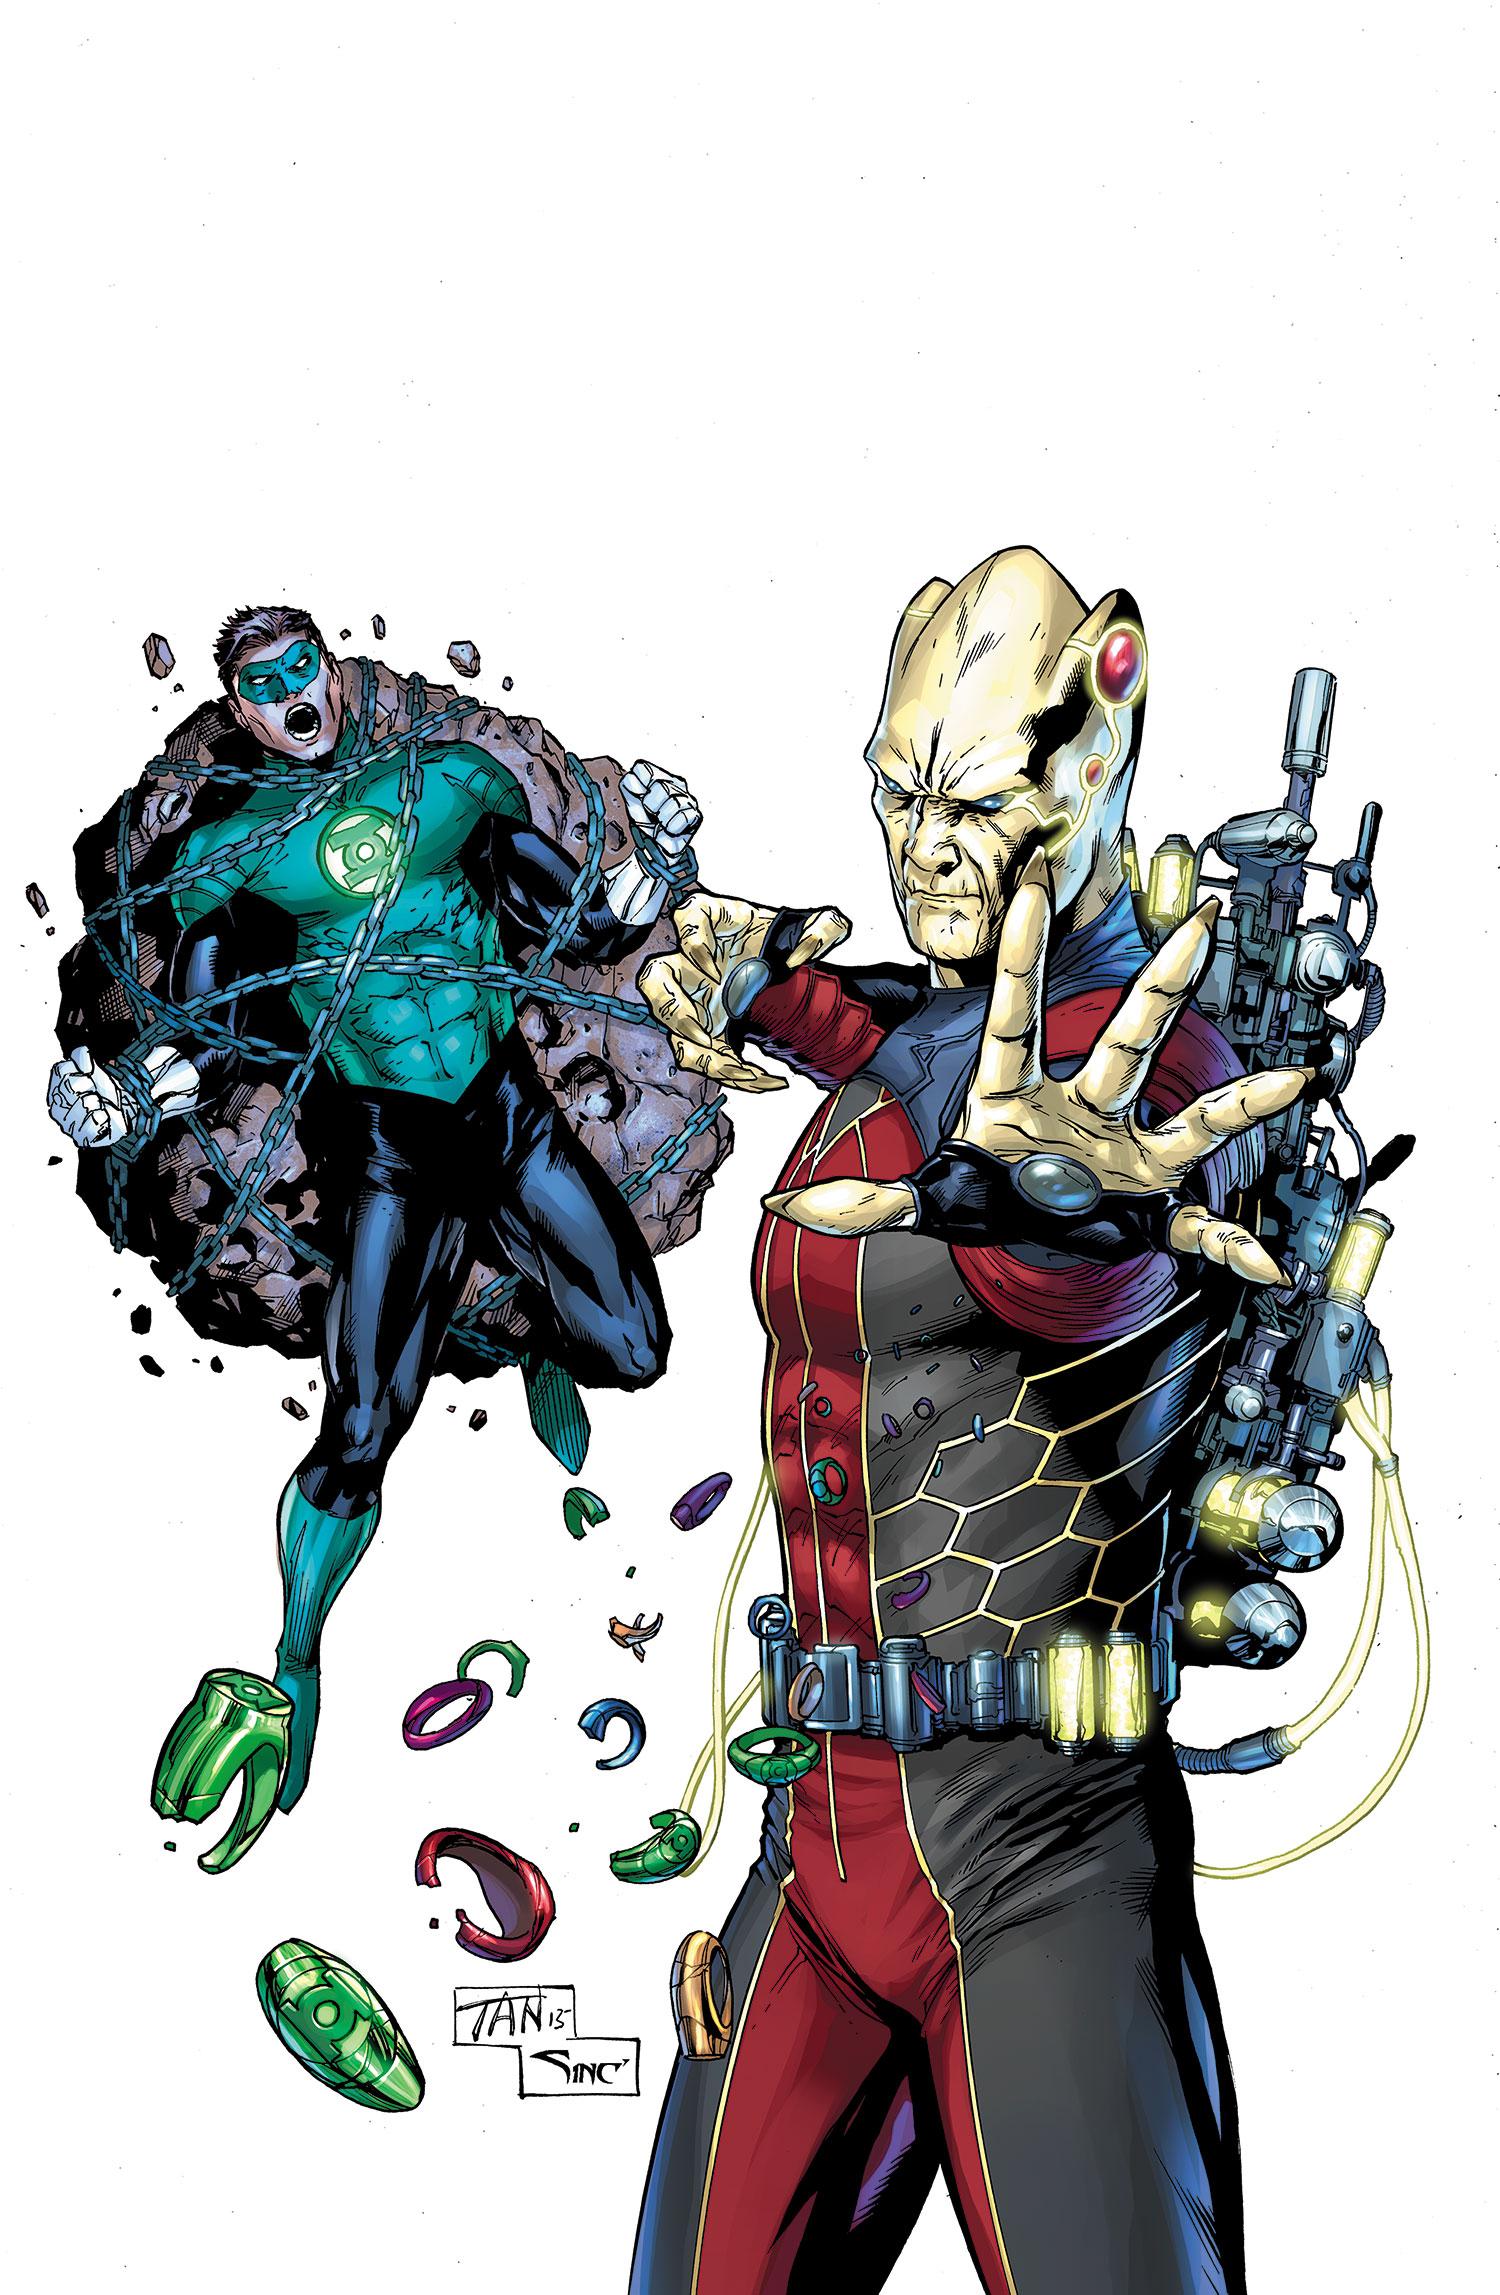 Green Lantern Vol 5 23.1 Relic Textless.jpg